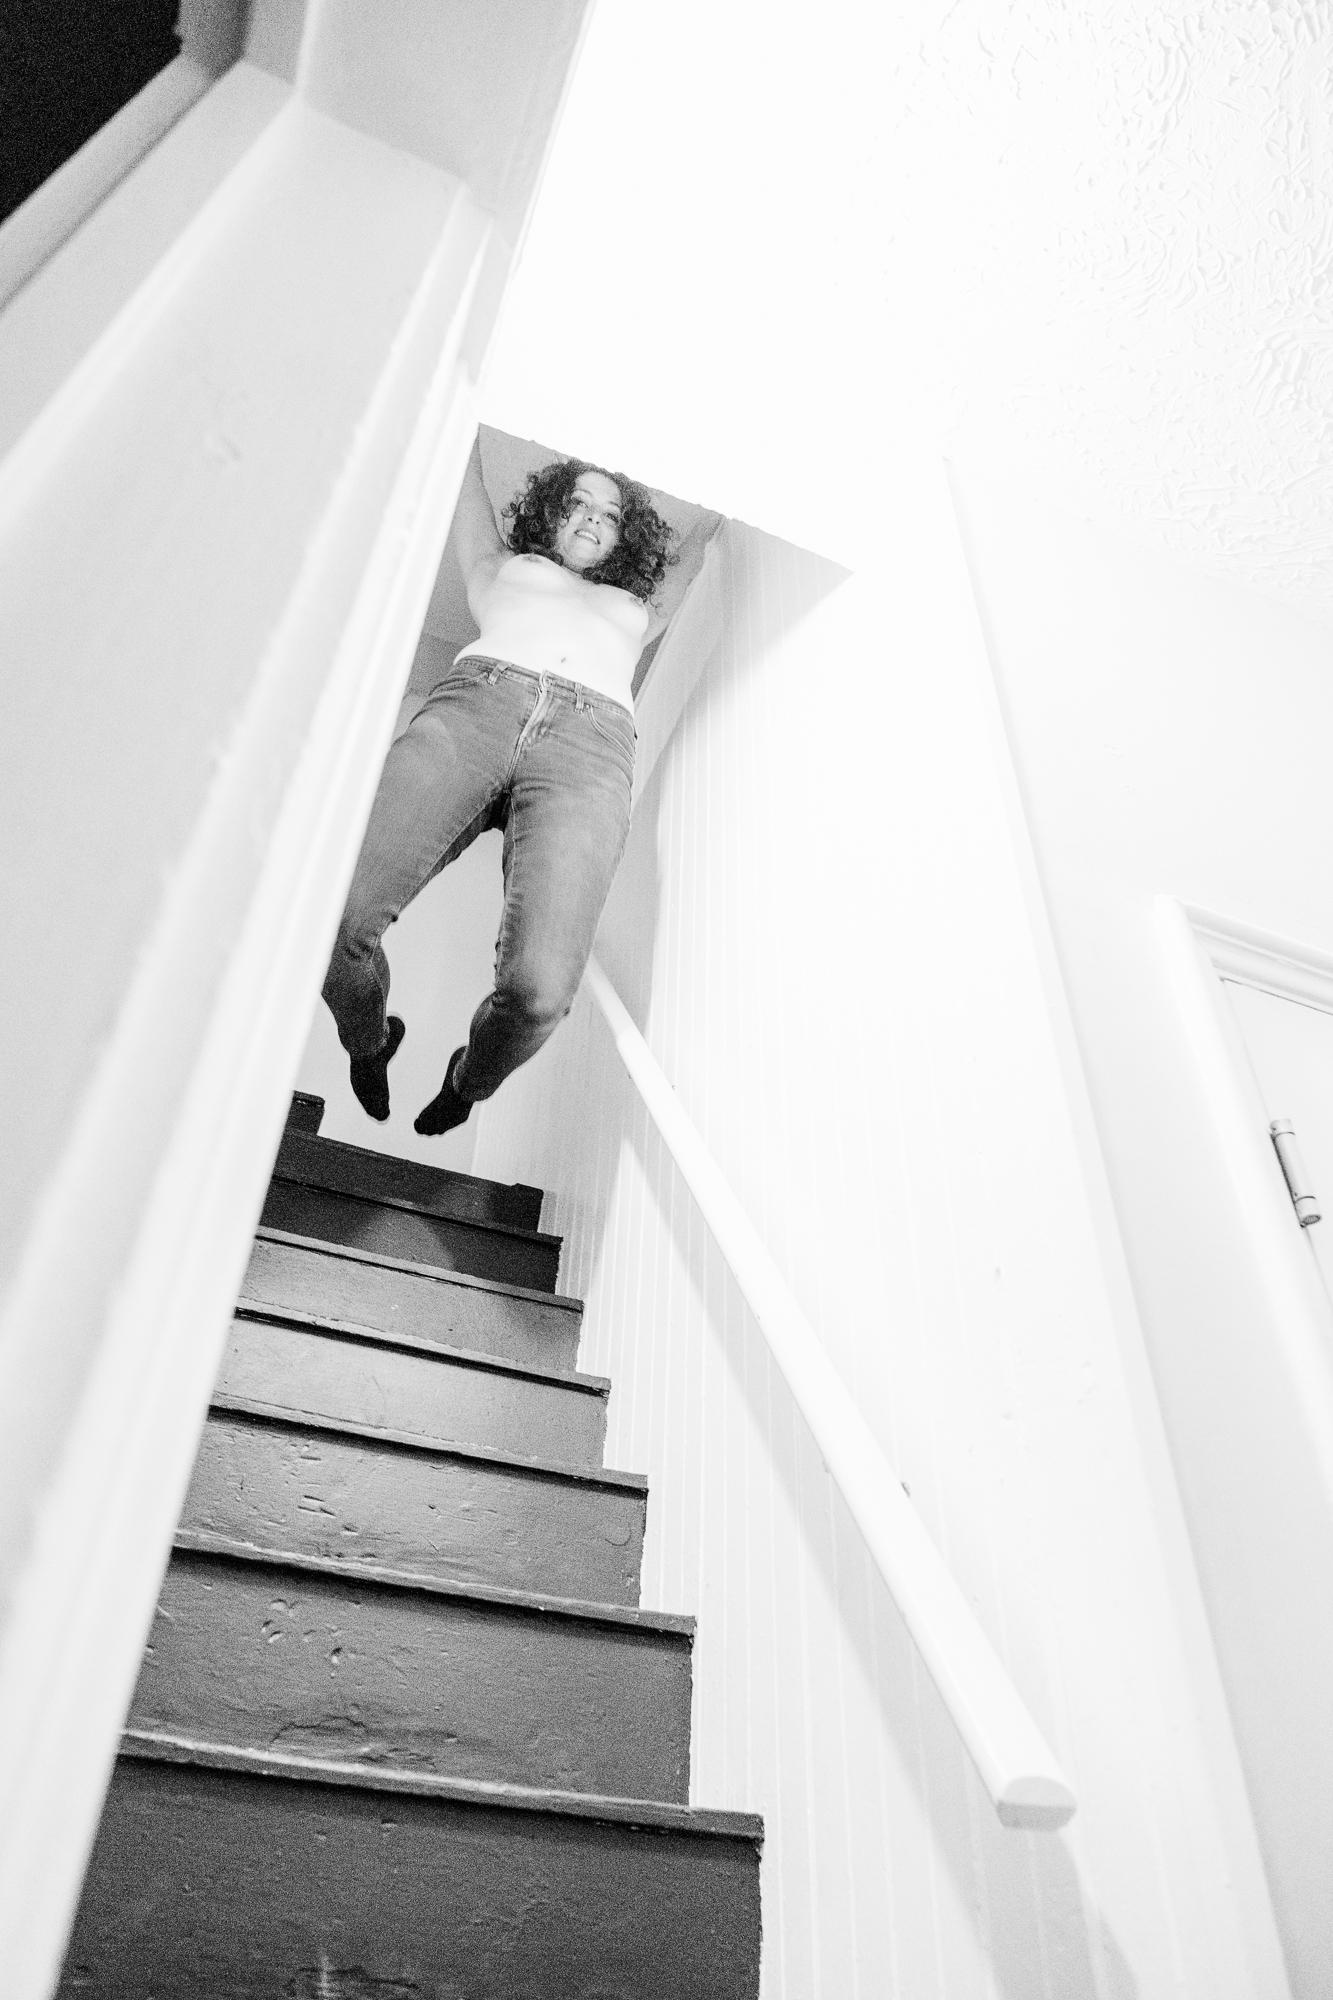 20181128-Brandi-Hannah-apartment-X-T2-0066-Edit.jpg